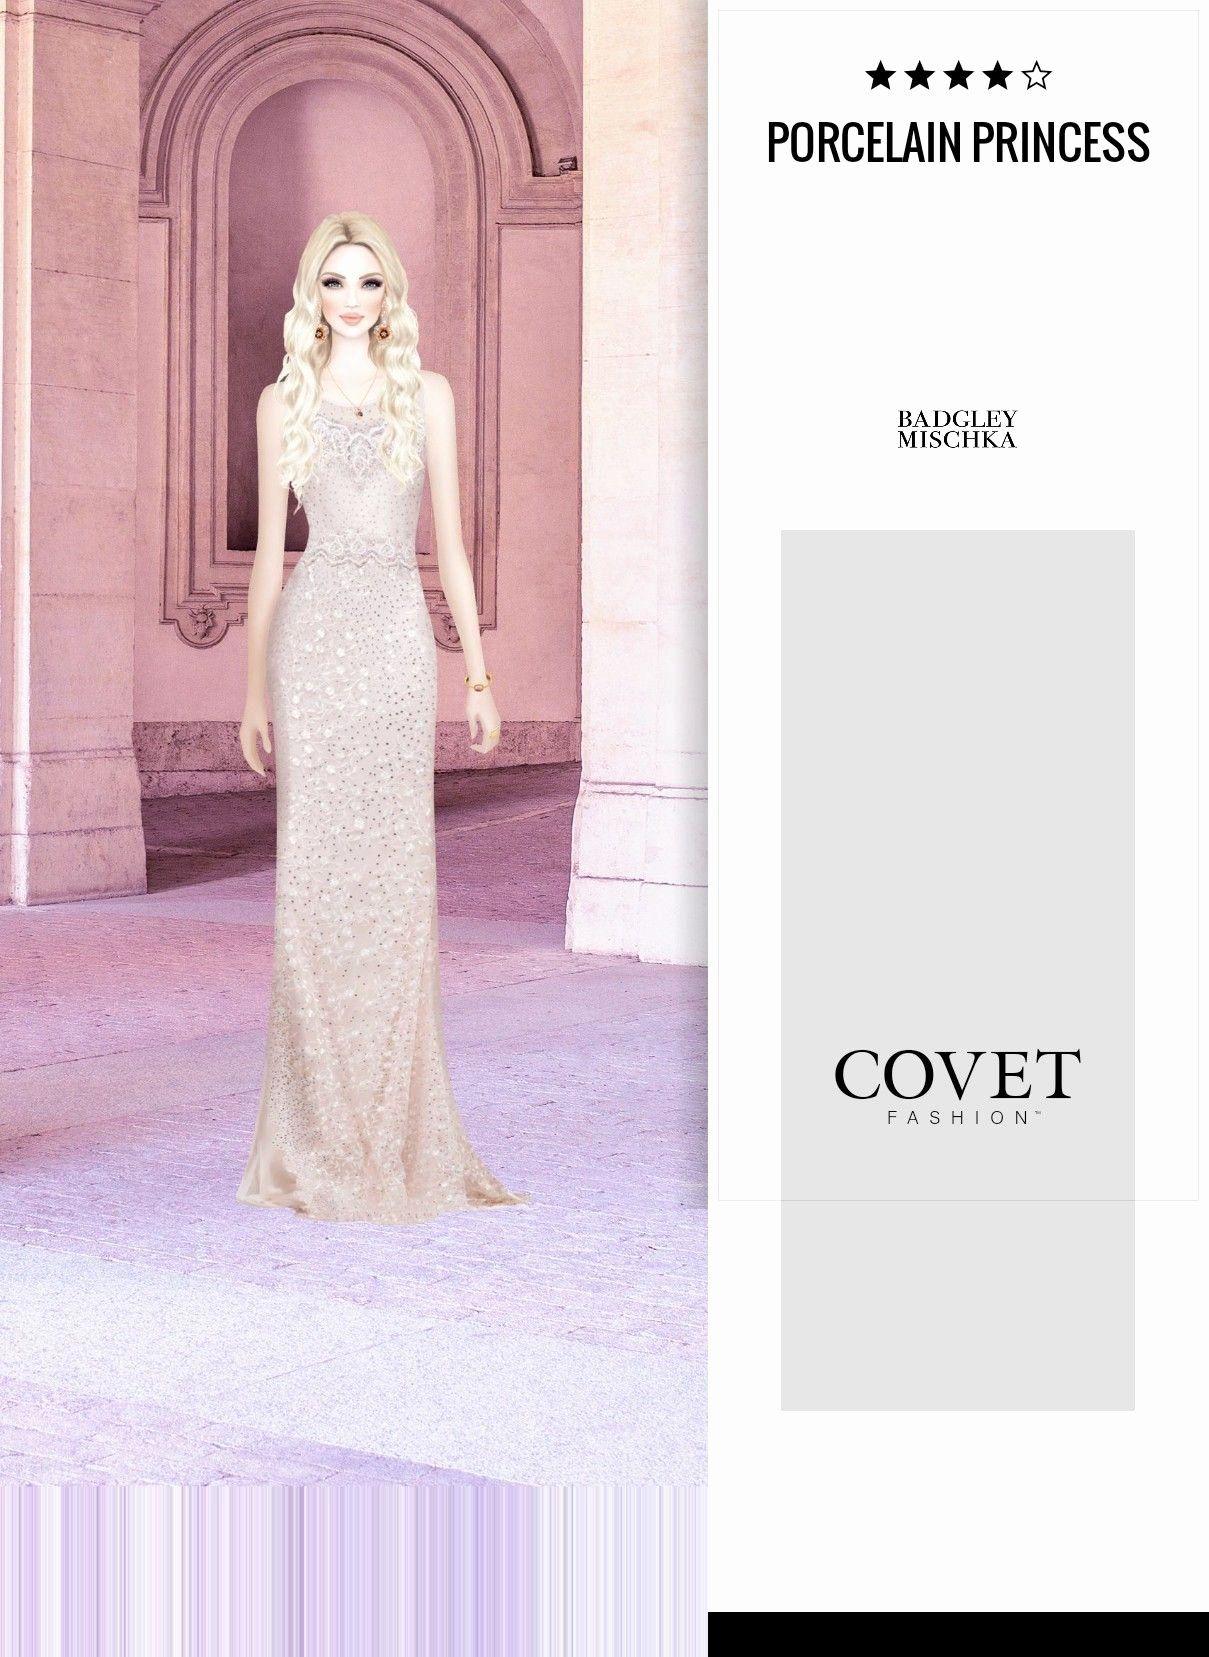 Wedding Dress Designers Games In 2020 Wedding Dresses Designer Wedding Dresses Game Dresses